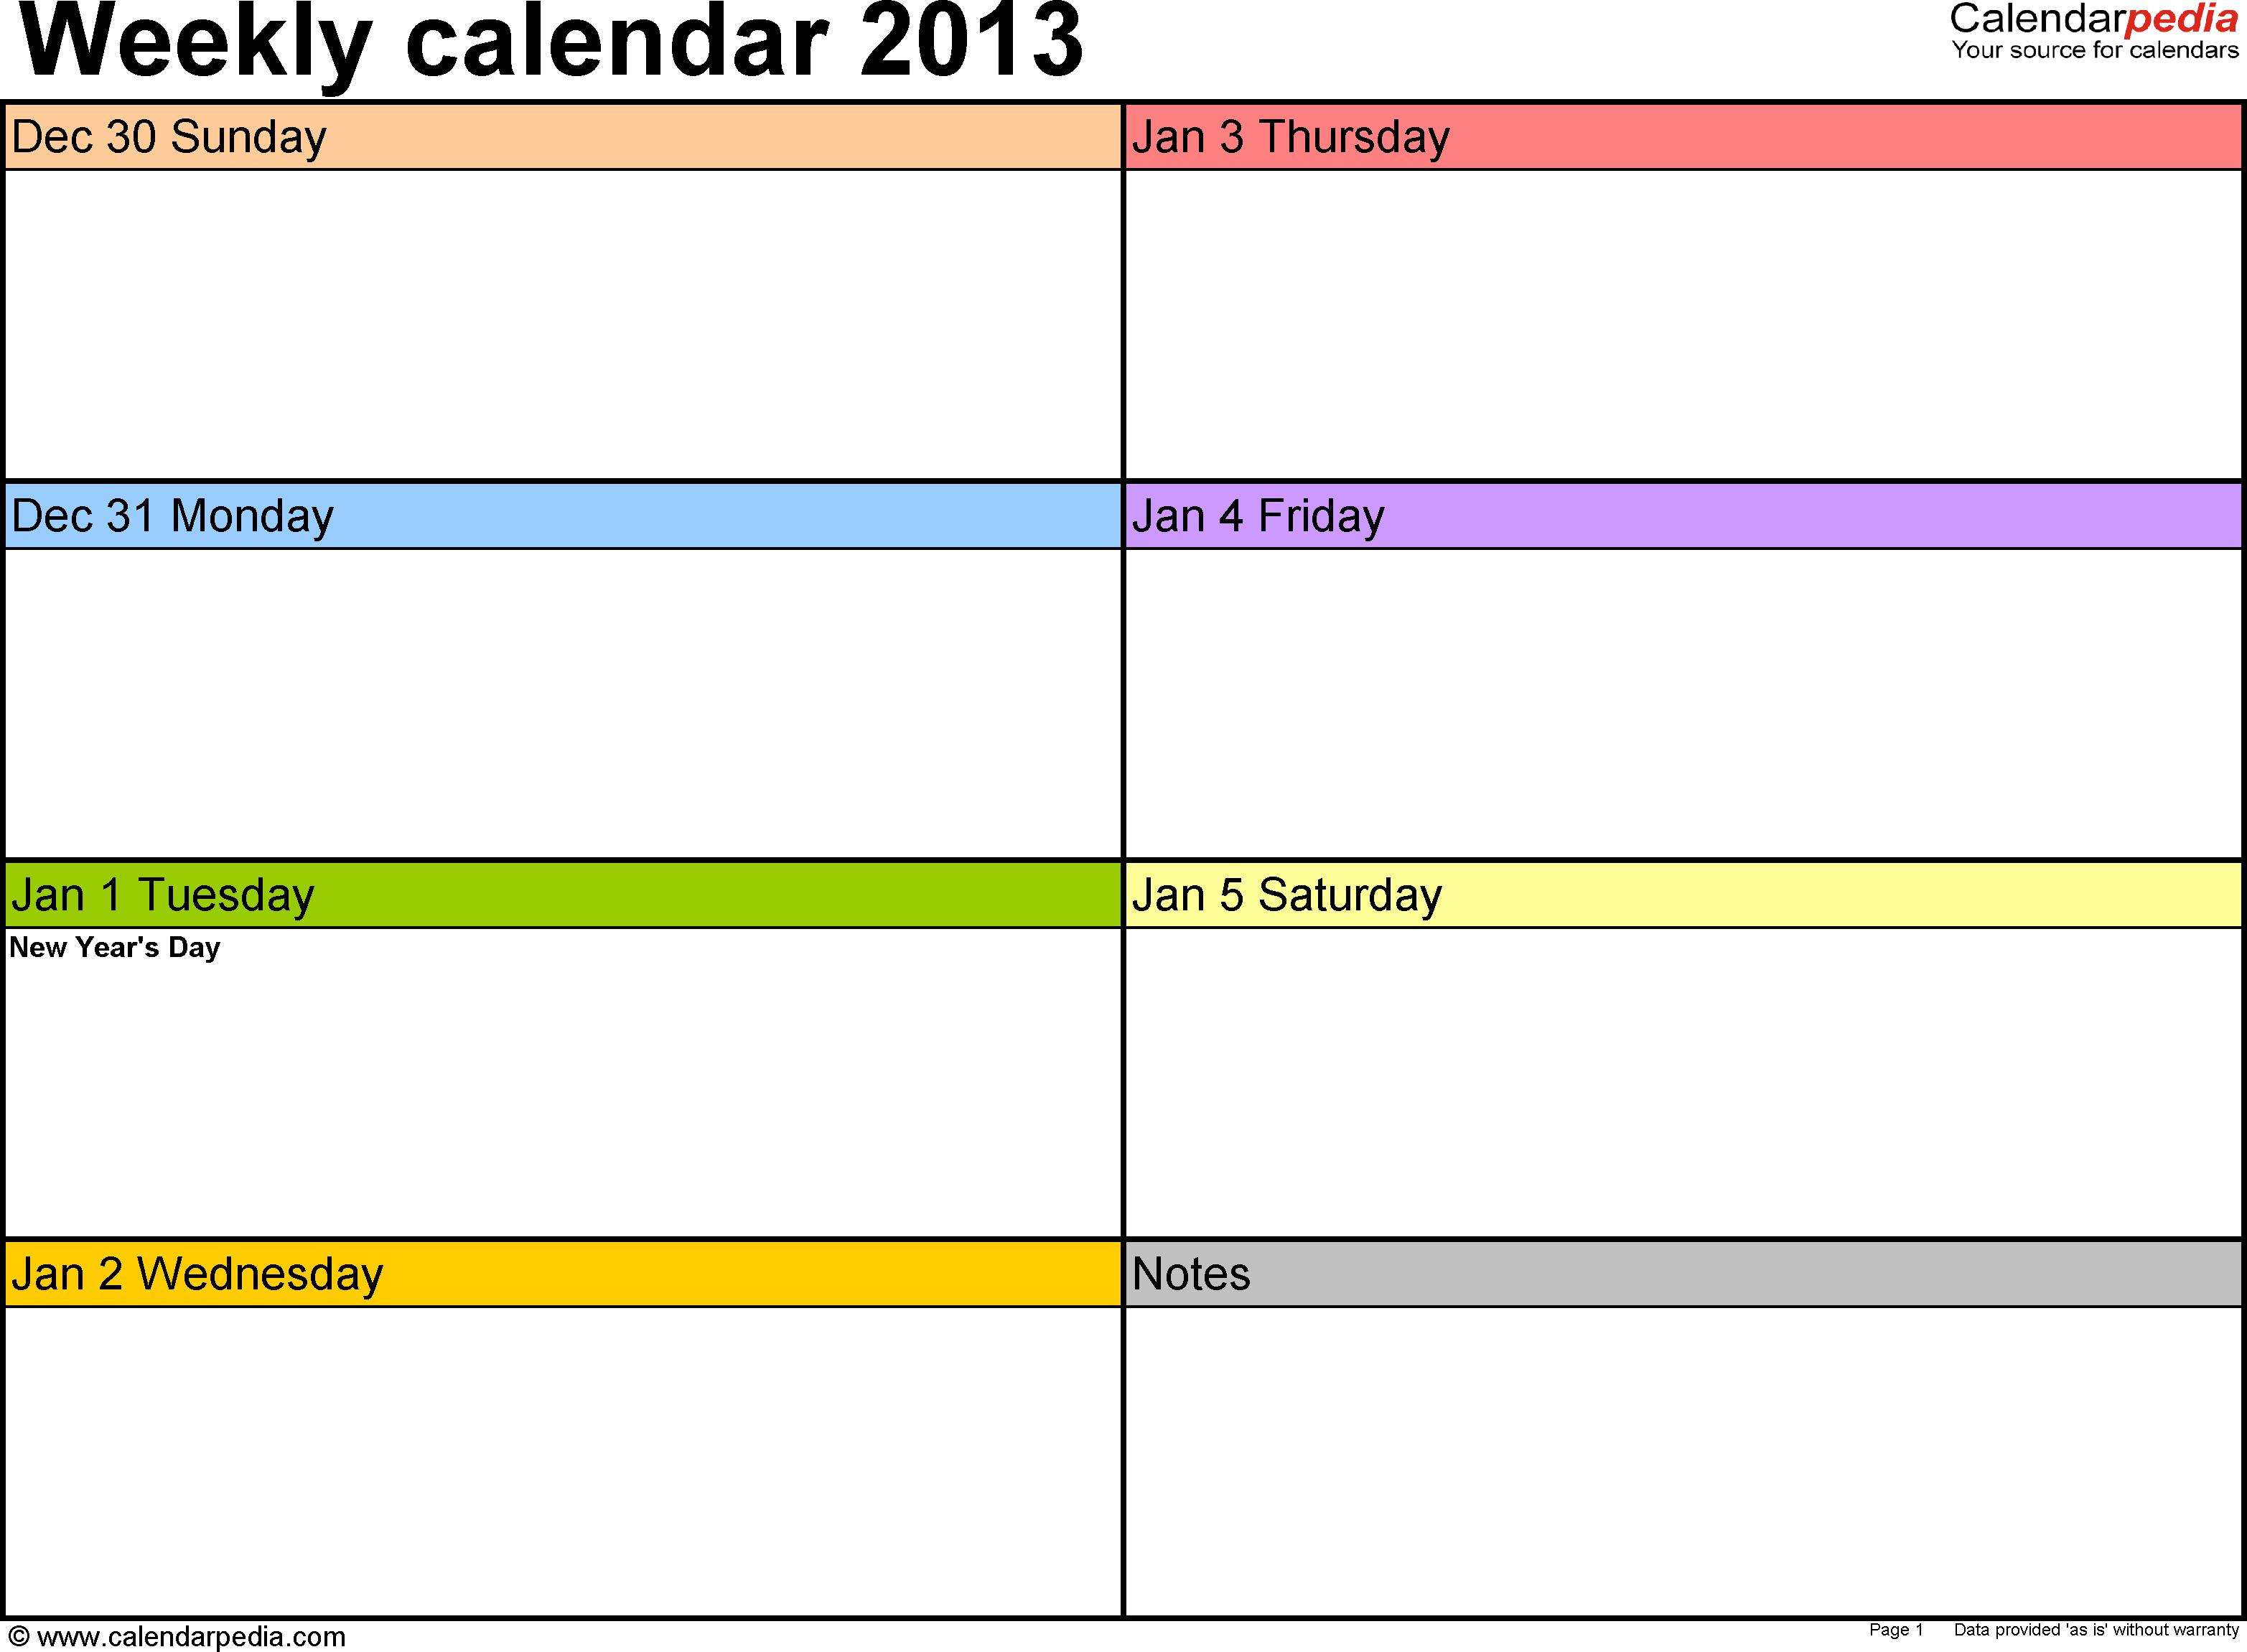 Weekly Calendar For Word Free Printable Plates Blank Plate Monthly inside Blank Printable Weekly Calendar